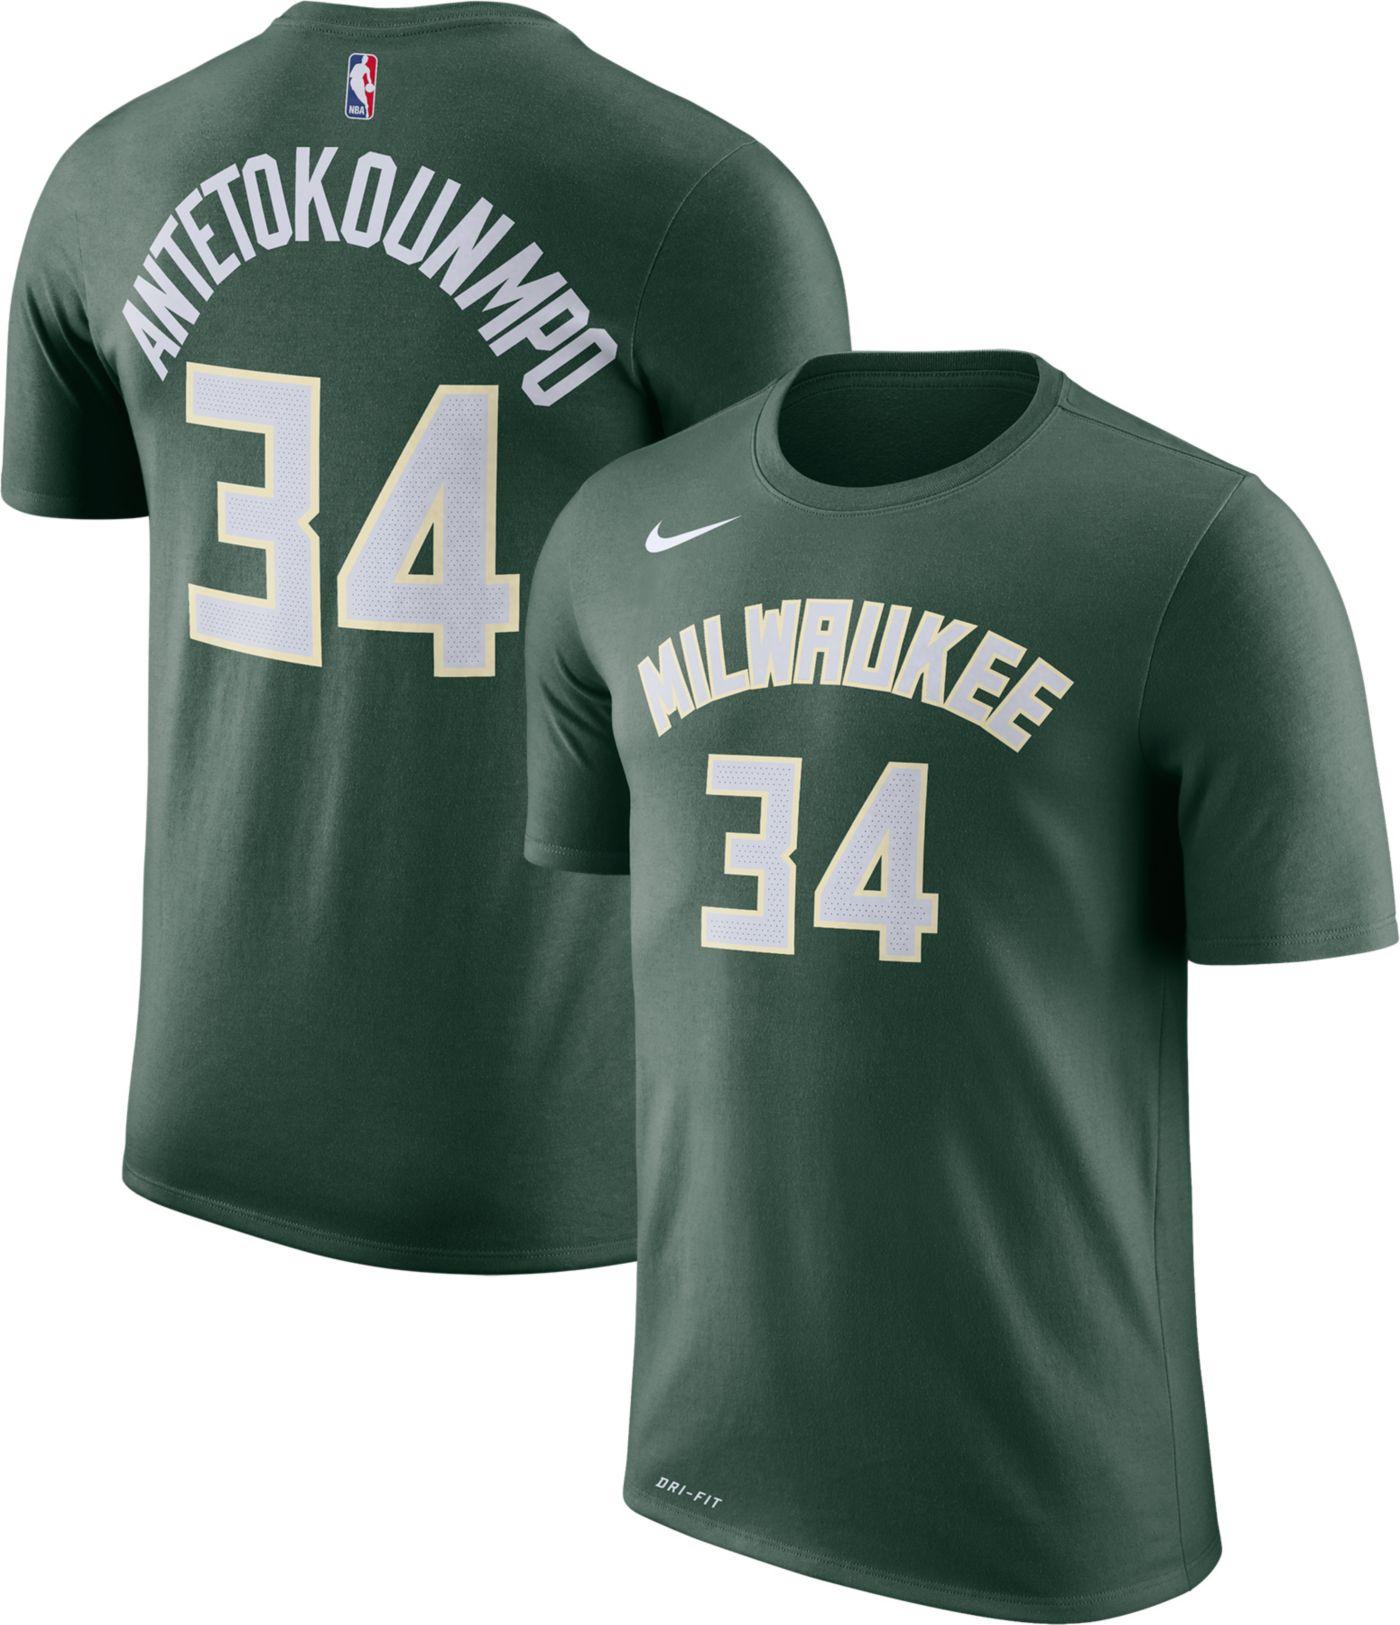 Nike Men's Milwaukee Bucks Giannis Antetokounmpo #34 Dri-FIT Green T-Shirt